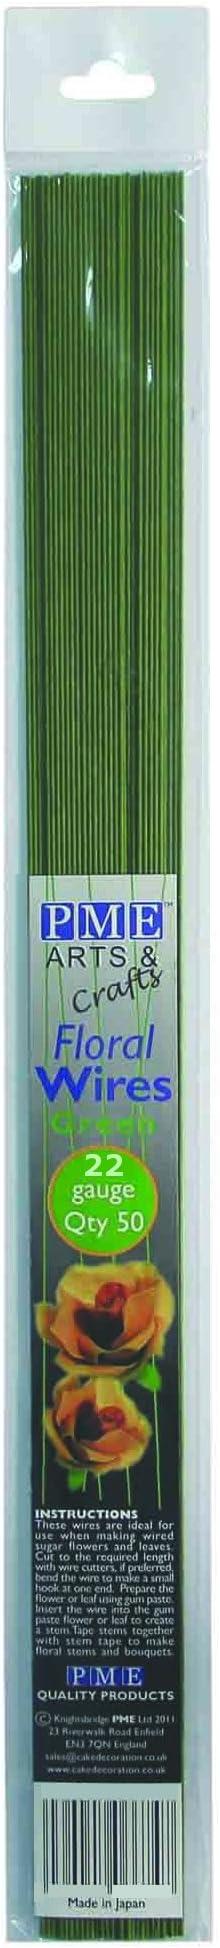 PME 50pk Florist Wires for Floral Flower Sugarcraft Gumpaste Cake Decoration